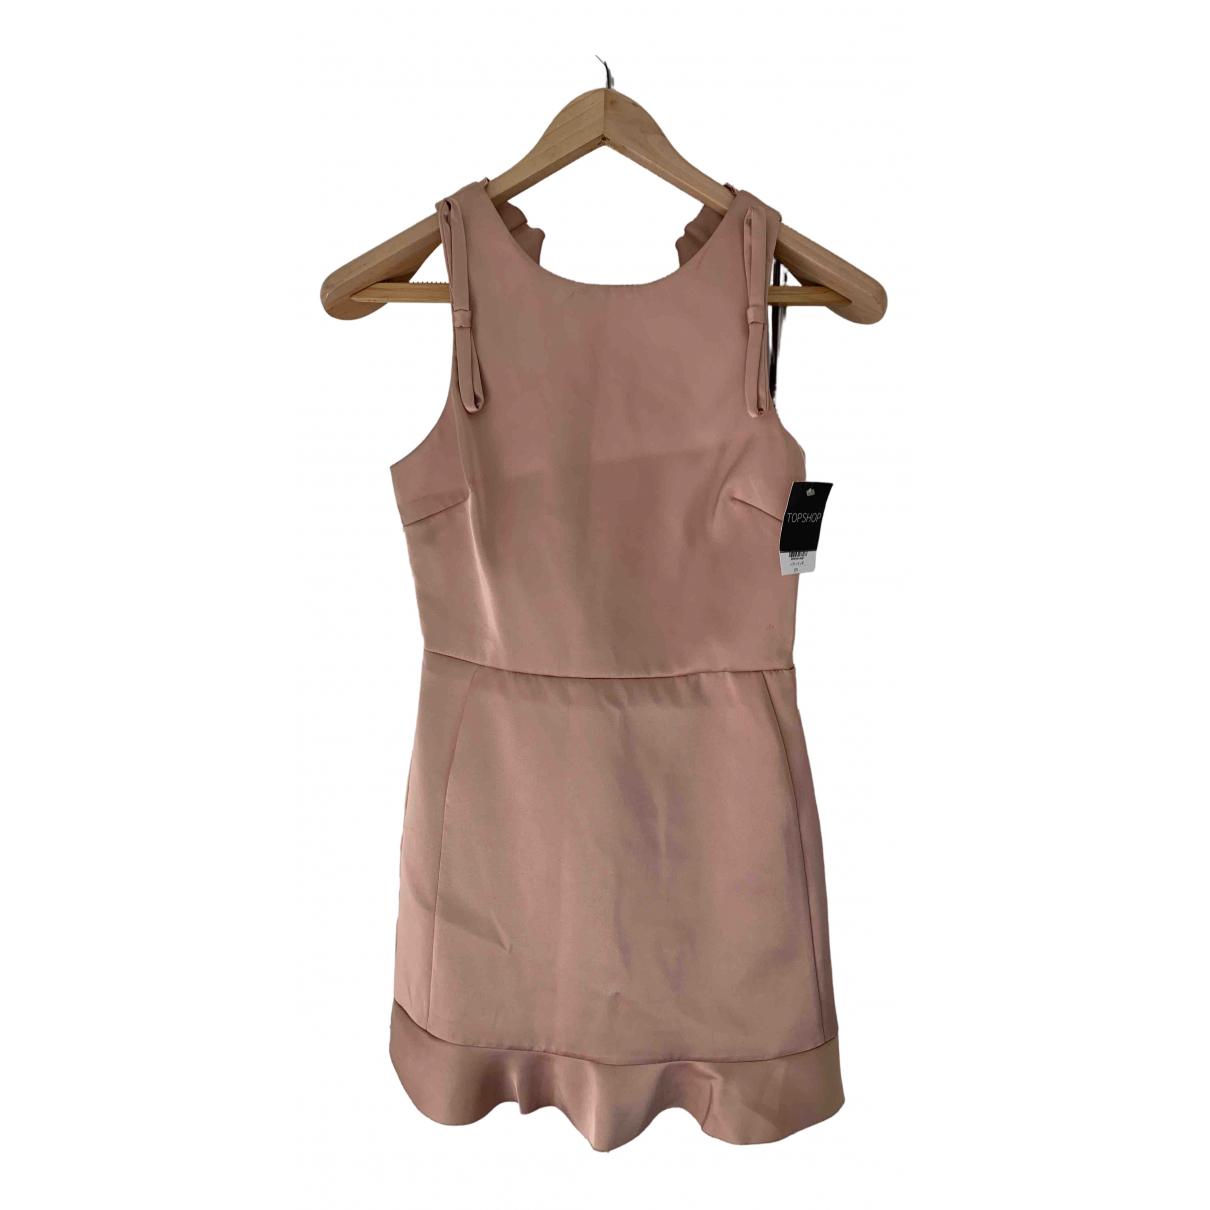 tophop \N Pink dress for Women 8 UK